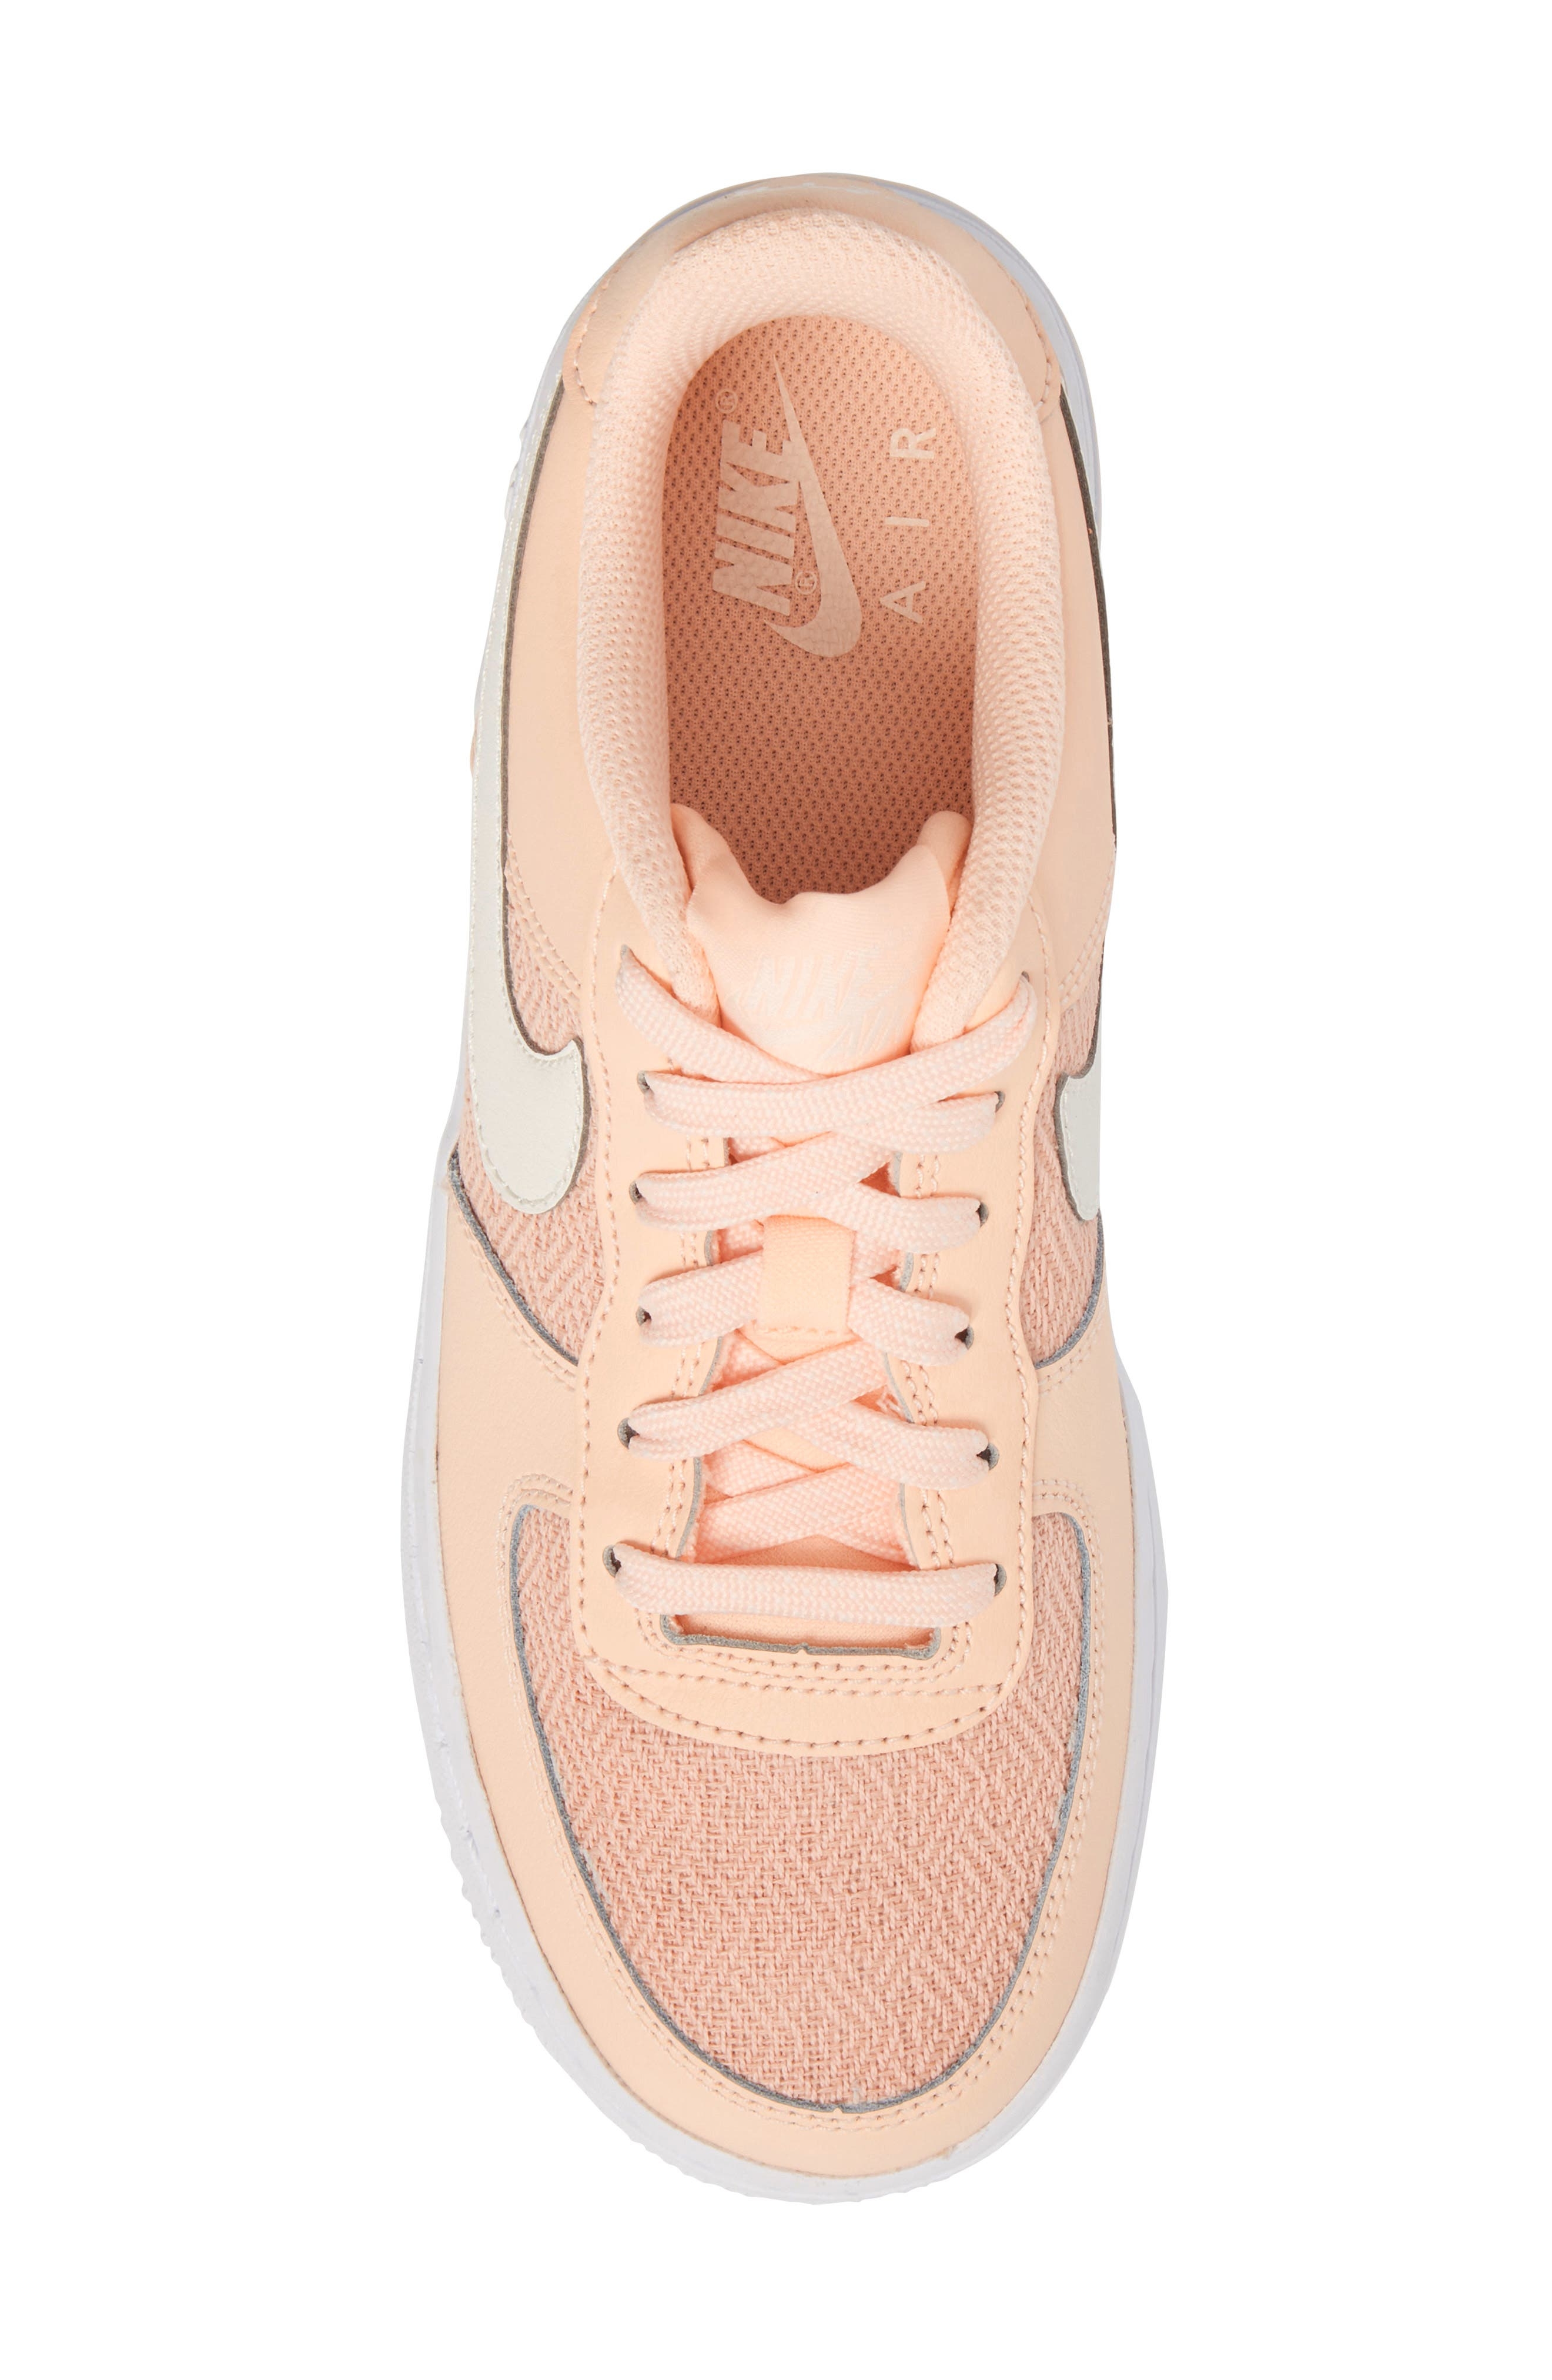 Air Force 1 LV8 Sneaker,                             Alternate thumbnail 23, color,